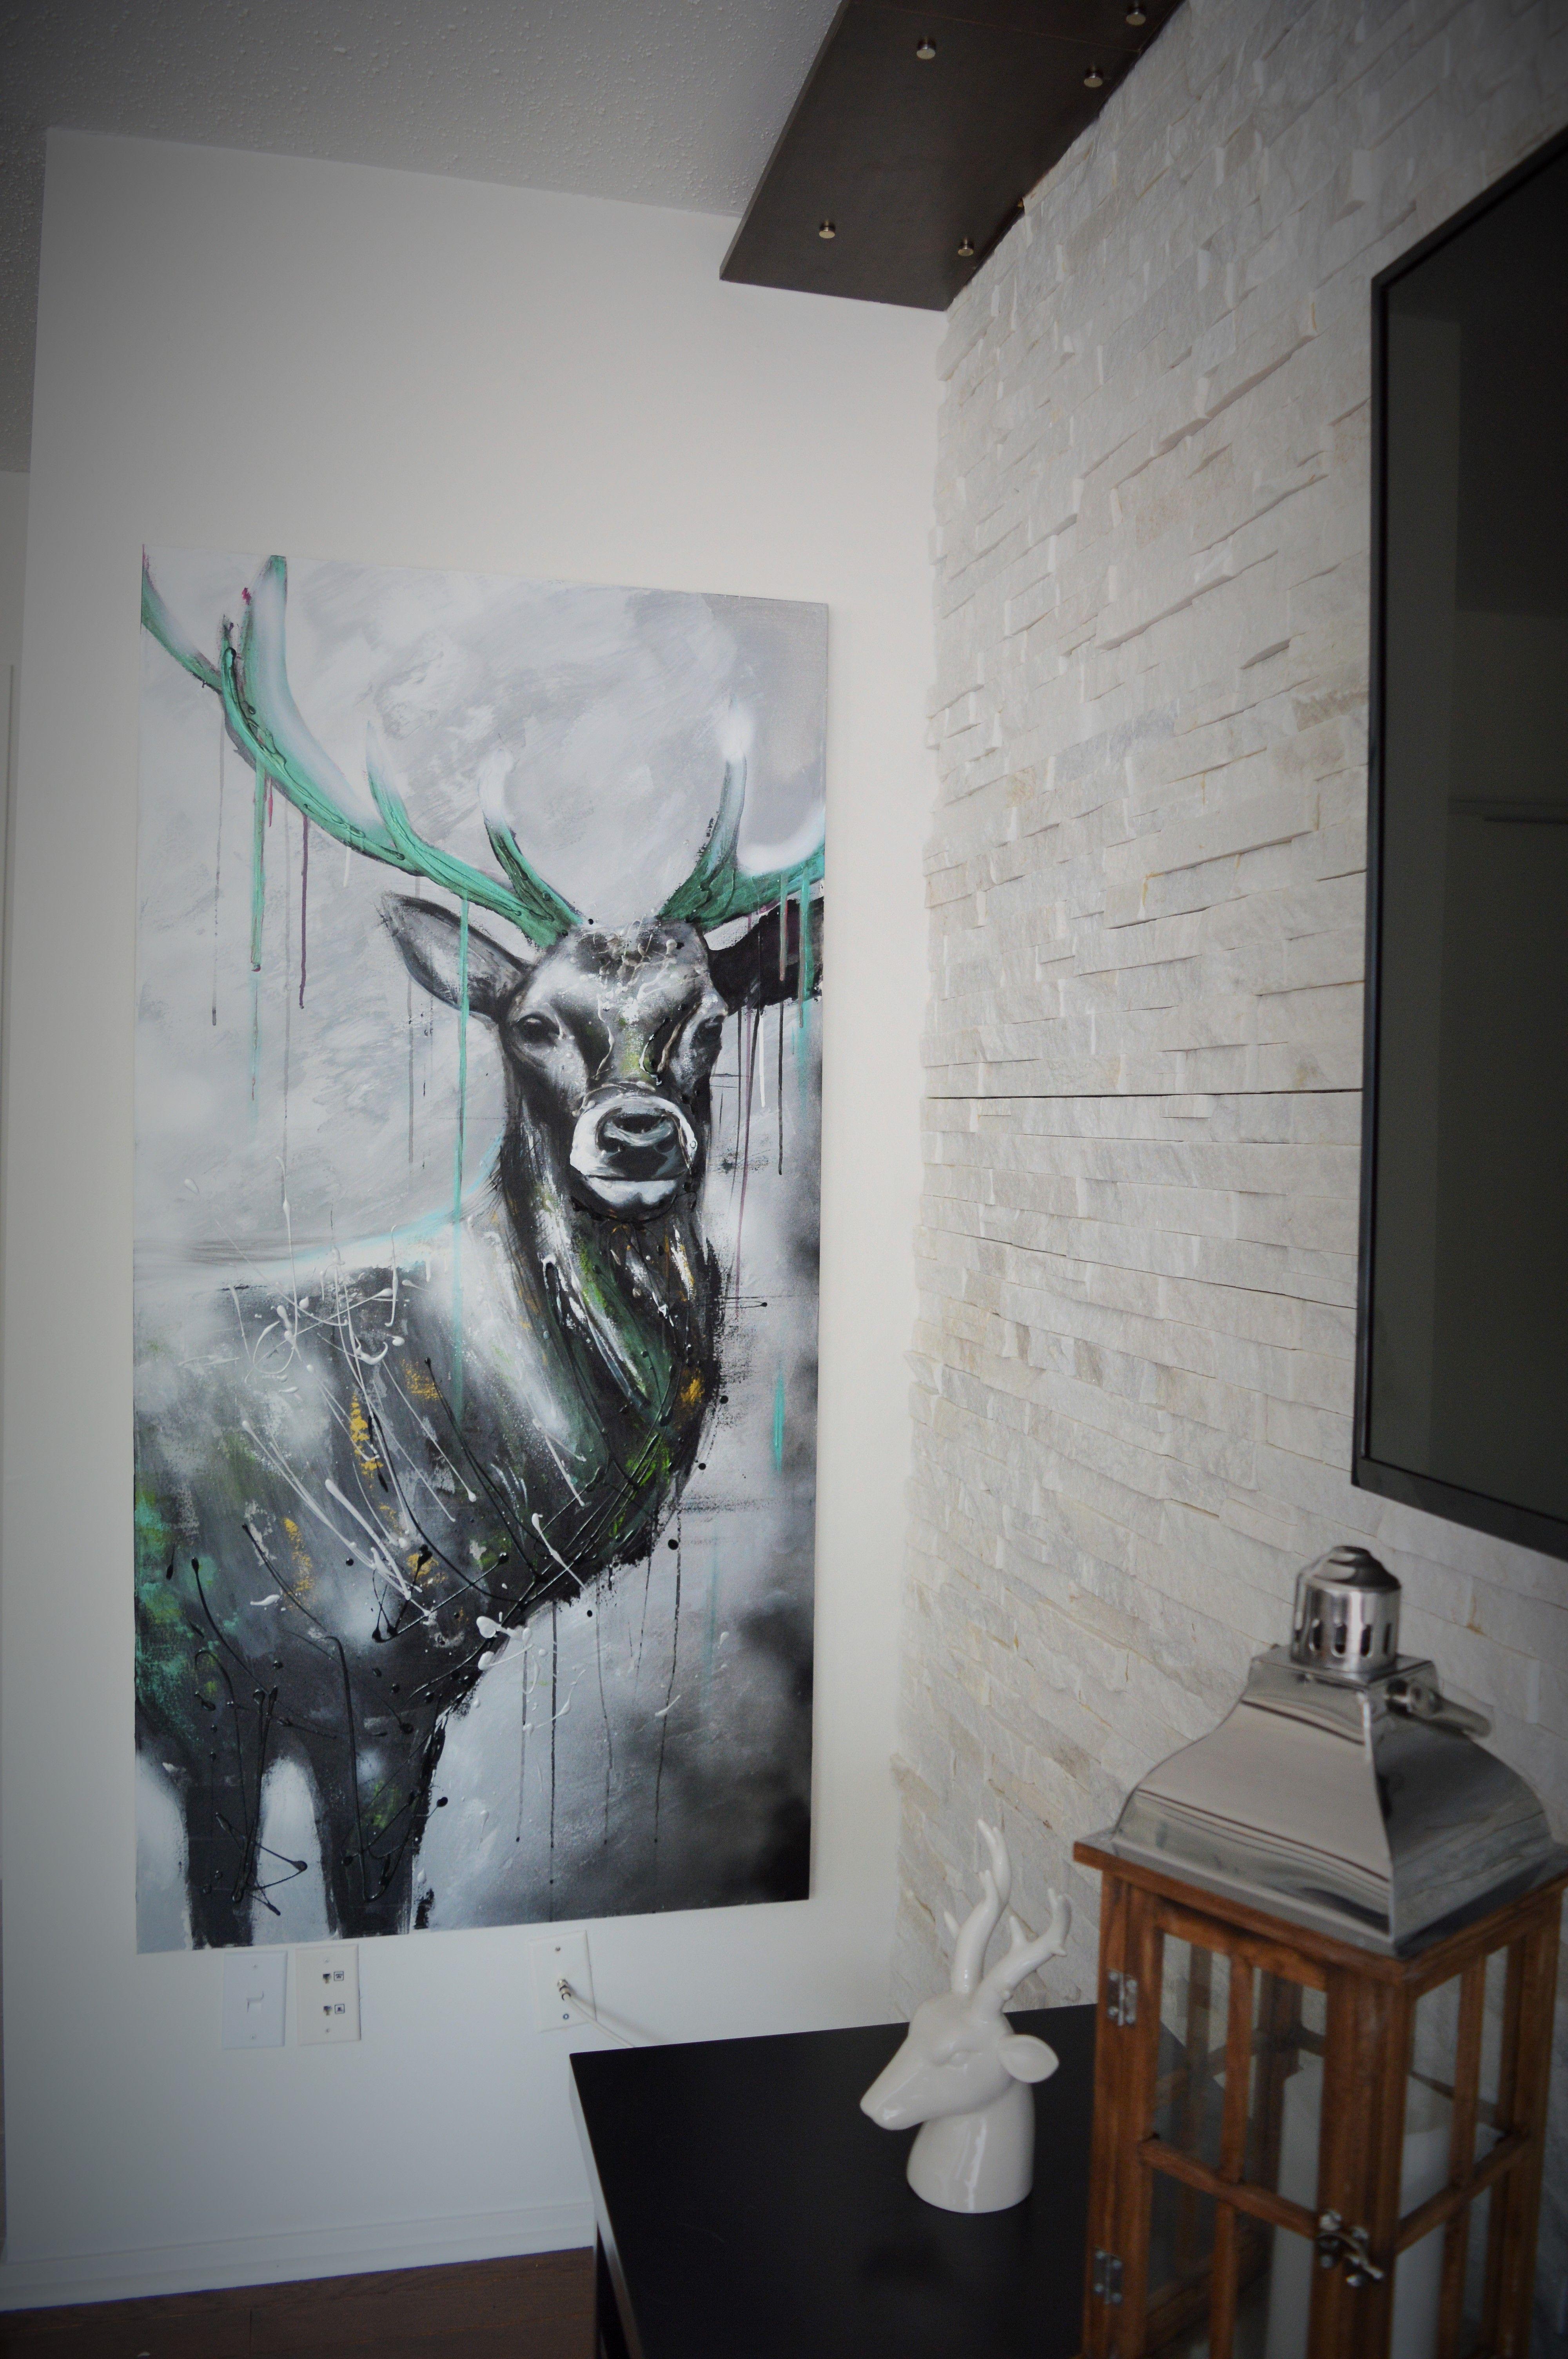 39 39 monsieur muscles 39 39 30x60 pouces acrylique sur toile mahlen pinterest malerei malen - Leinwand bemalen ideen ...